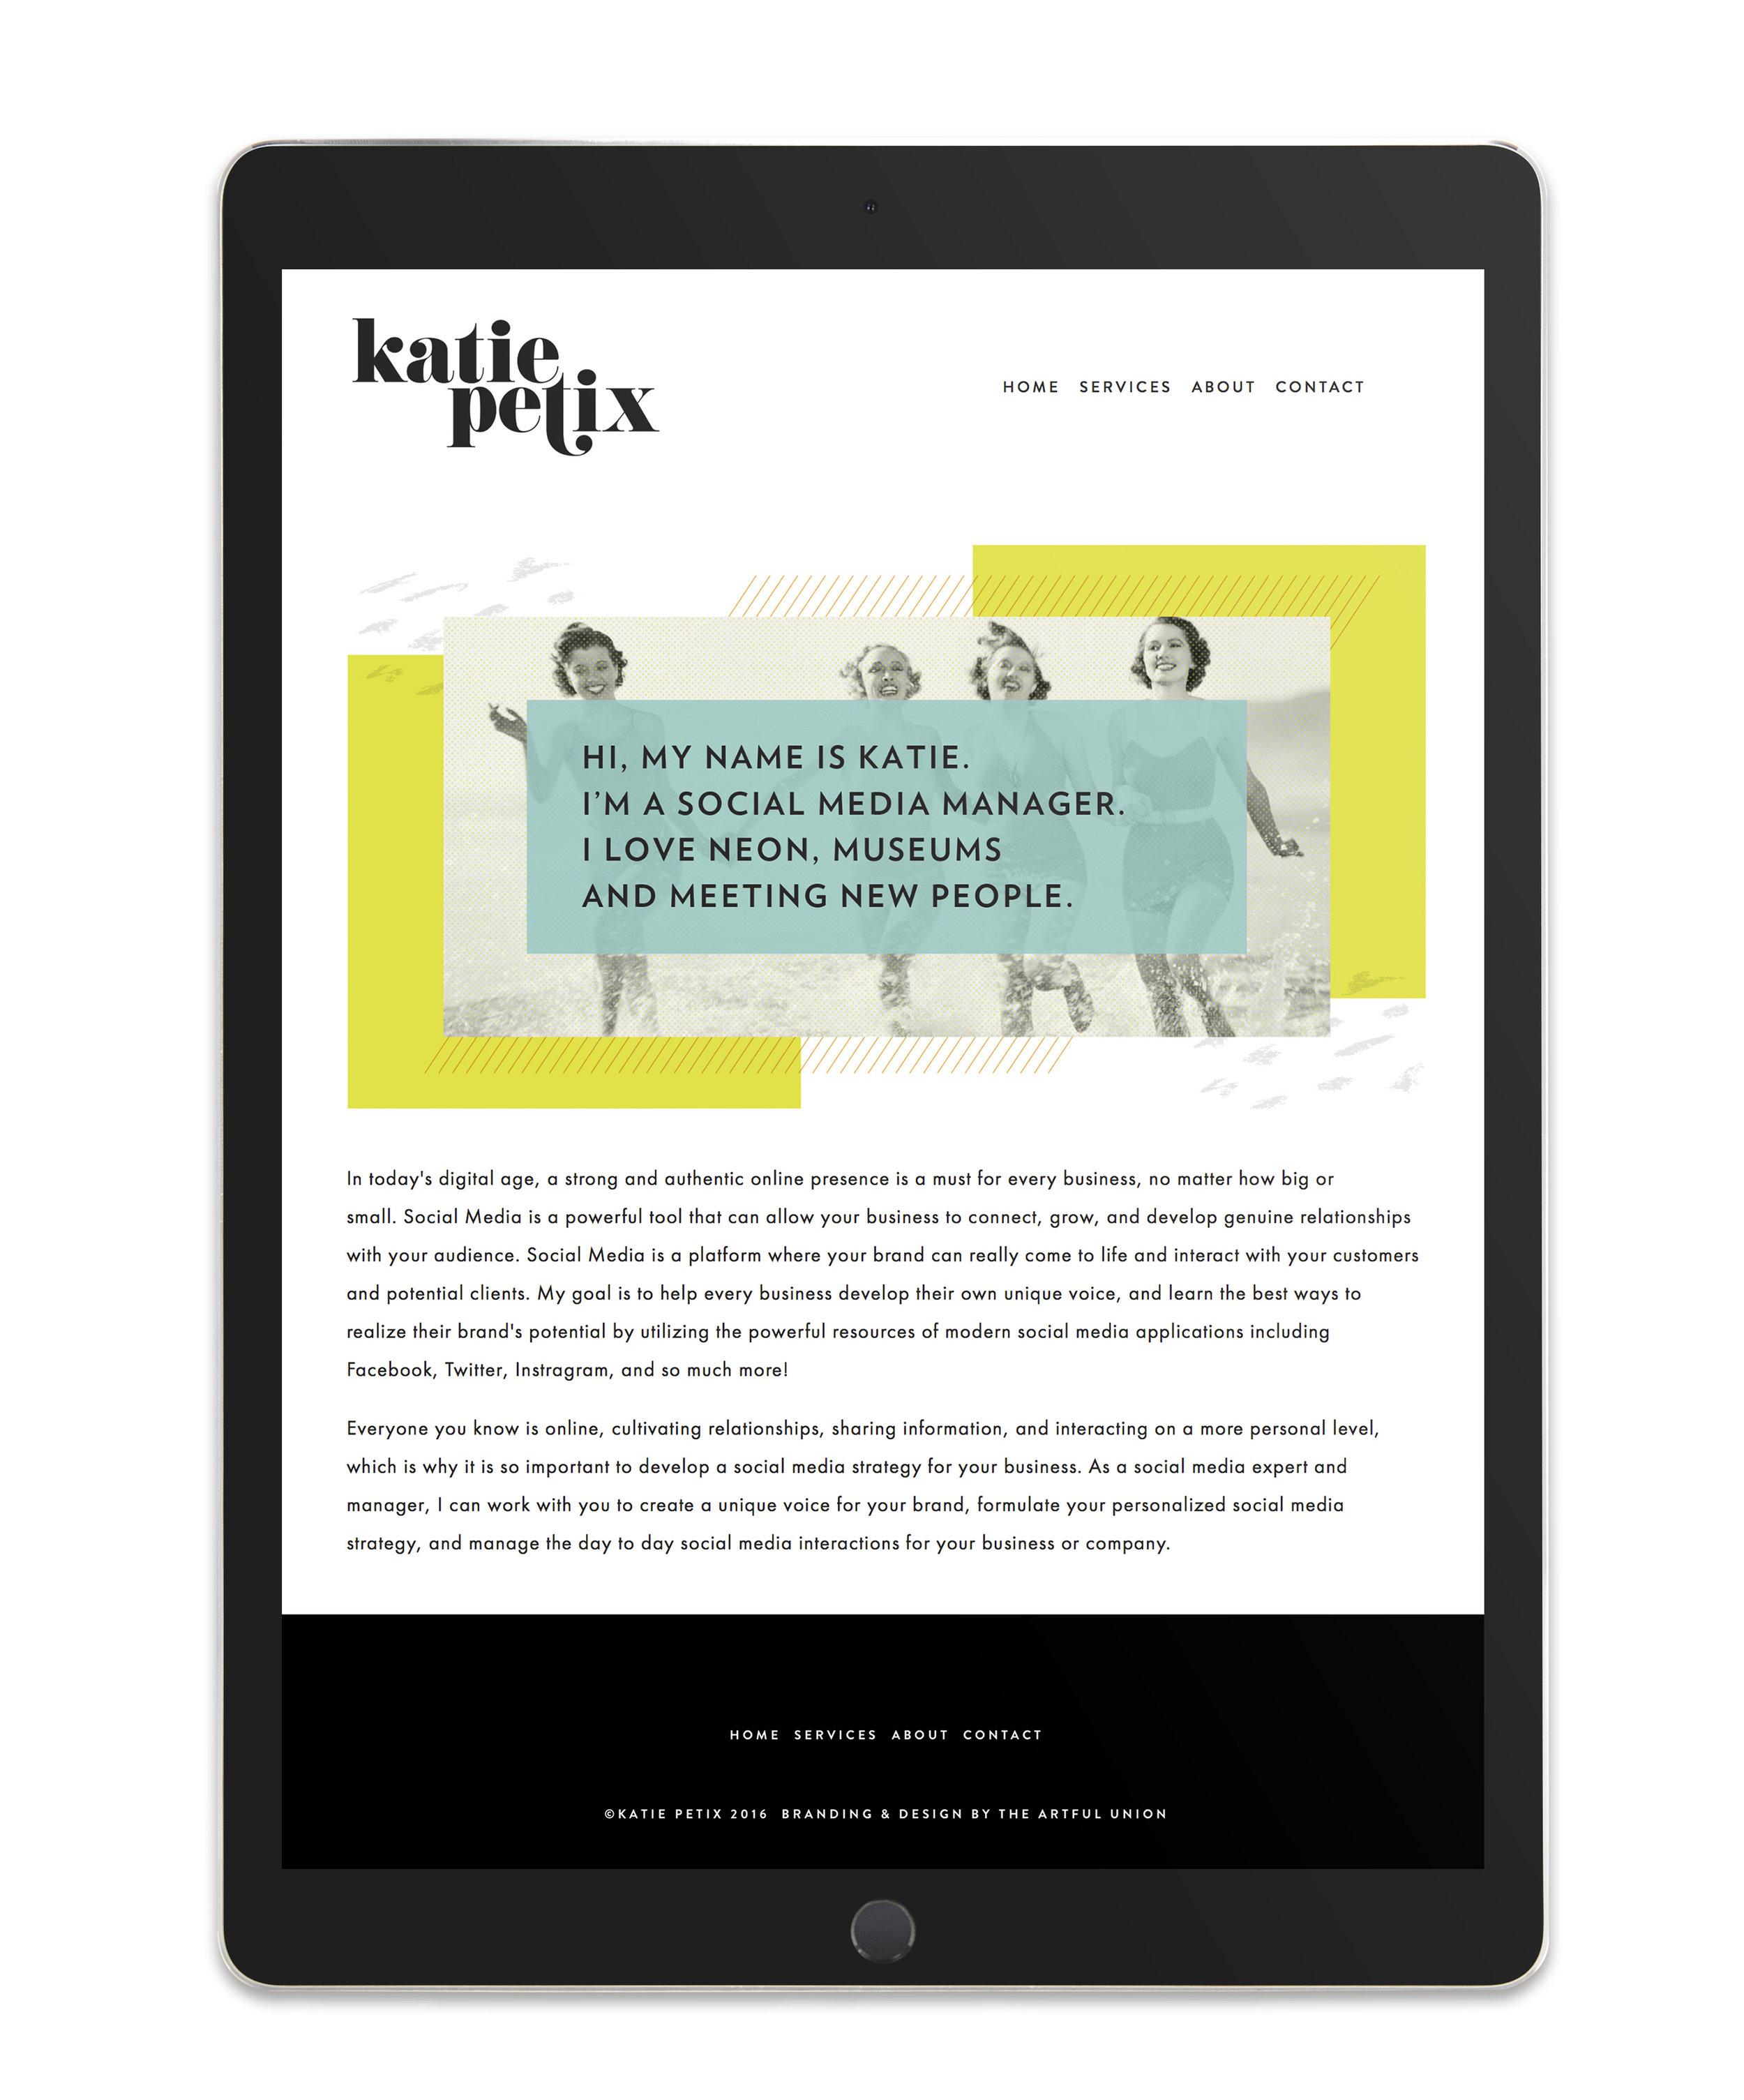 Katie-Petix-Social_Media-Modern-Neon-Retro-Web-Design.jpg